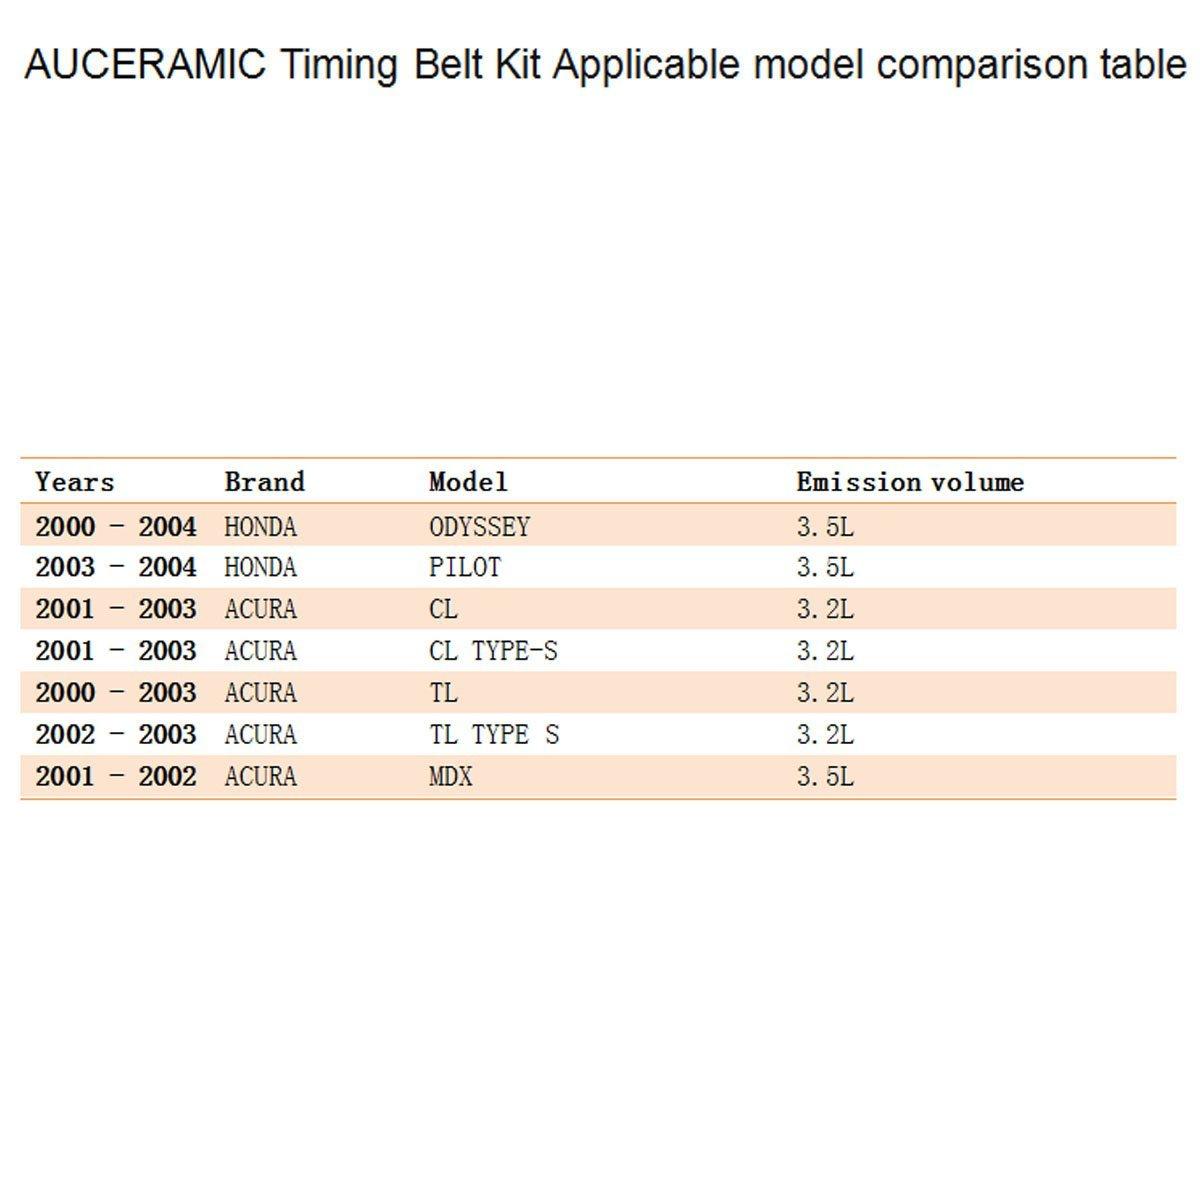 61uC068bdnL._SL1200_ acura tl 3 2 timing belt diagram for an 2000 acura tl 3 2 facebook